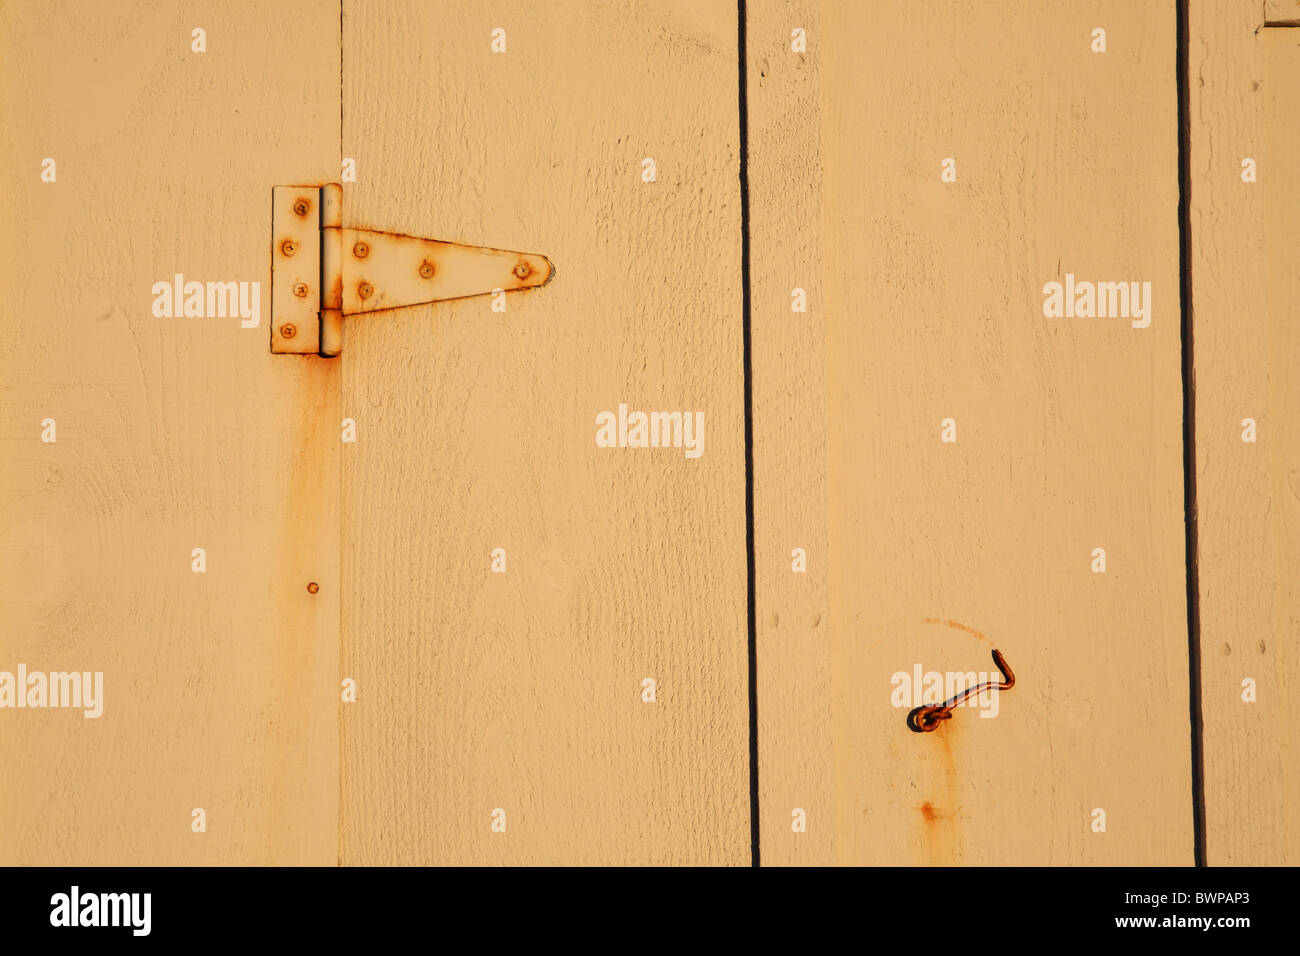 Rusted Hook Stockfotos & Rusted Hook Bilder - Alamy